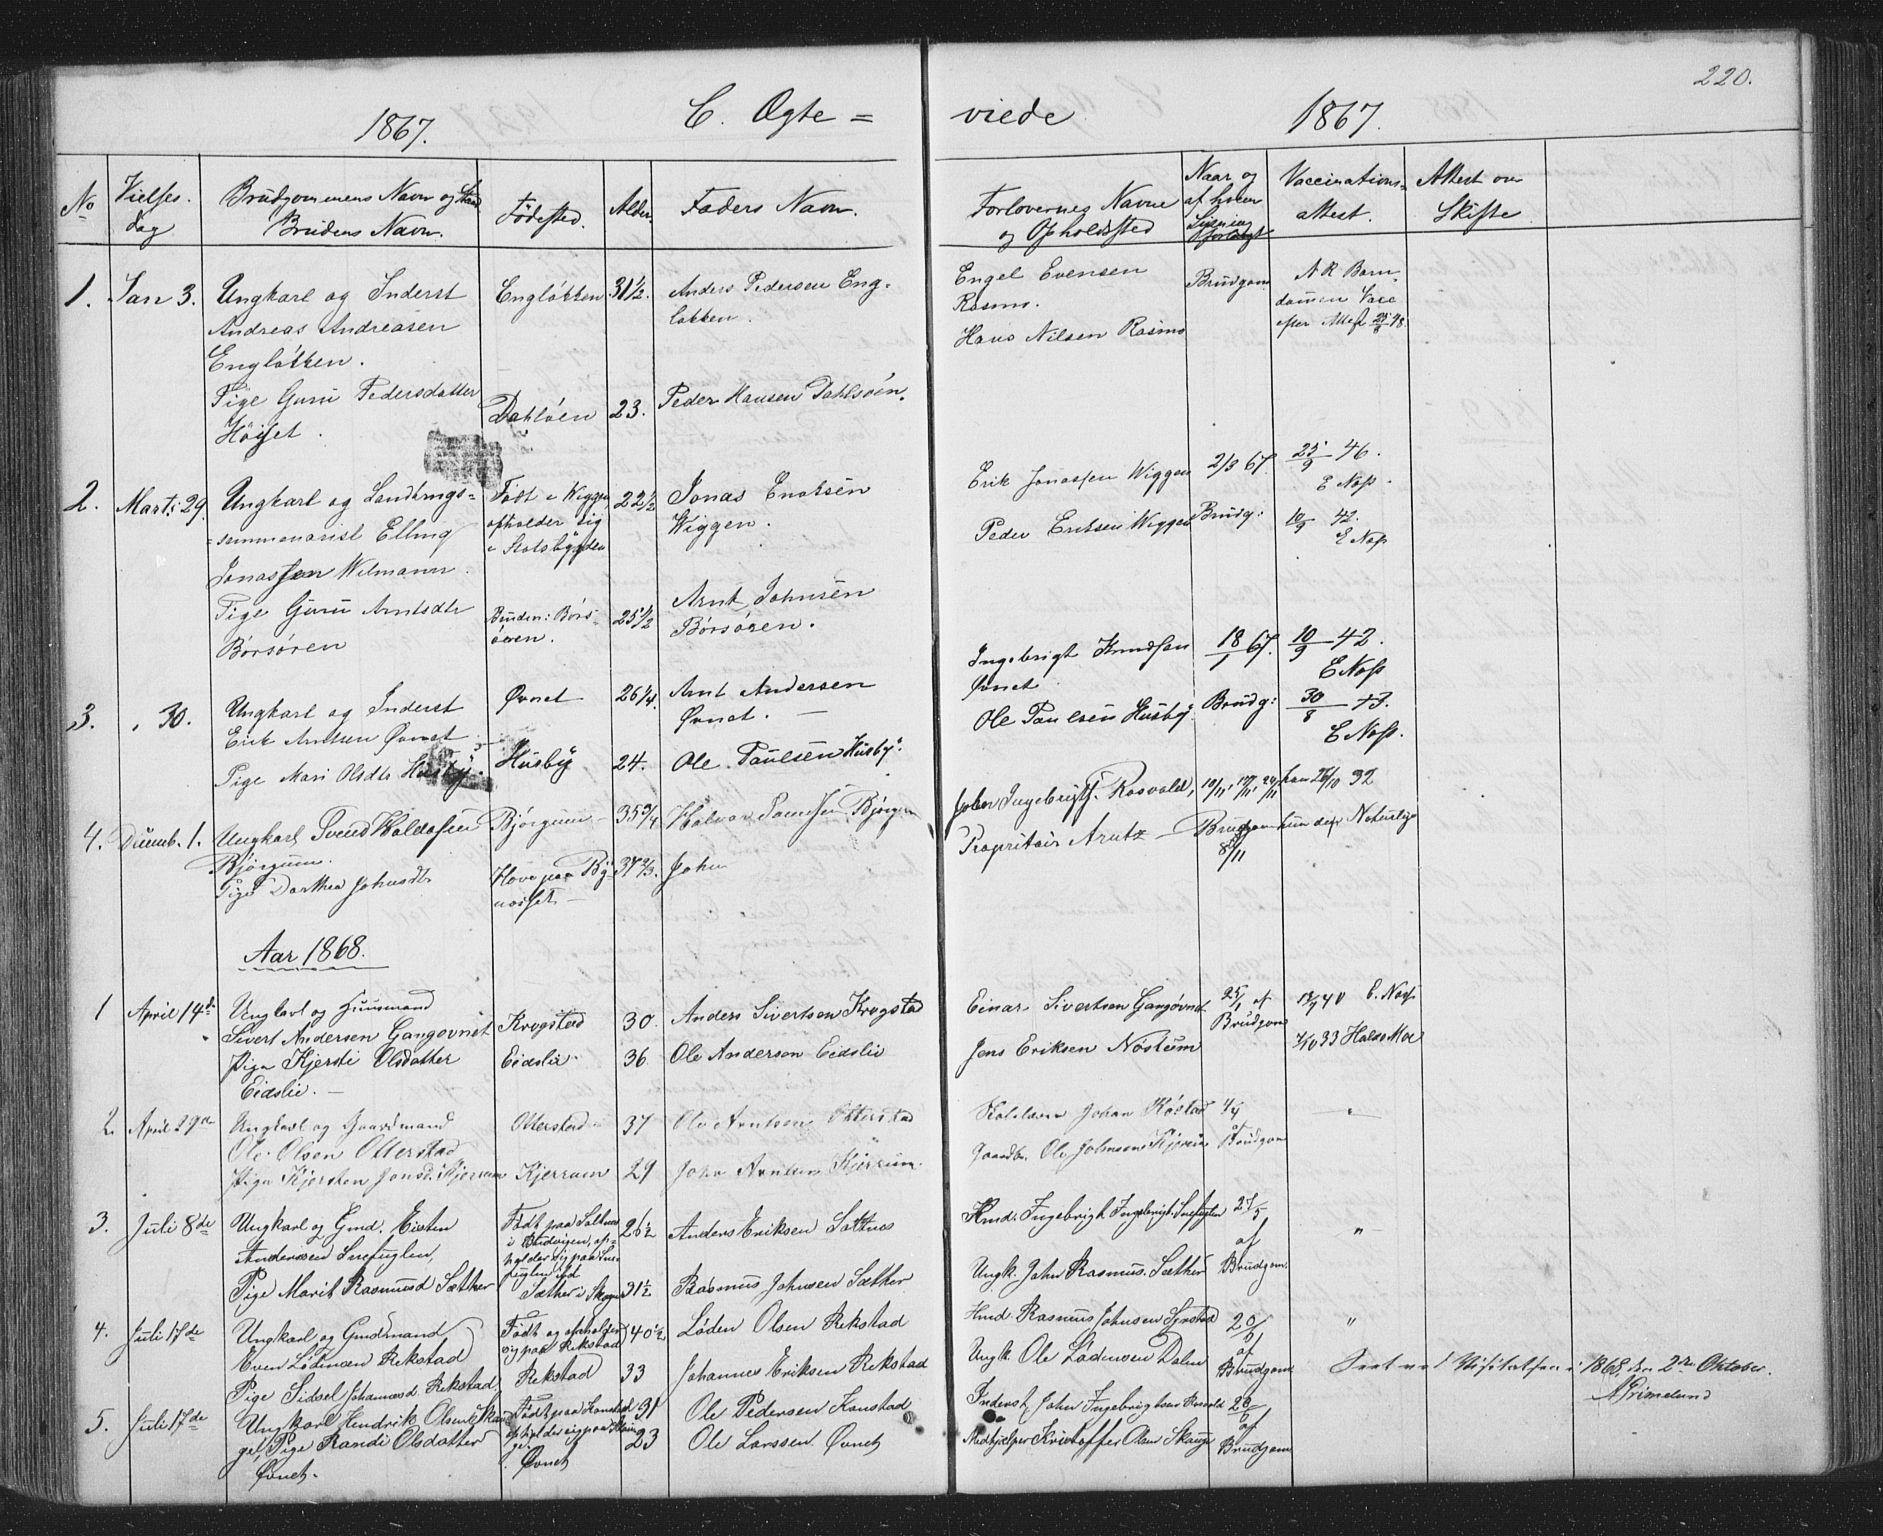 SAT, Ministerialprotokoller, klokkerbøker og fødselsregistre - Sør-Trøndelag, 667/L0798: Parish register (copy) no. 667C03, 1867-1929, p. 220